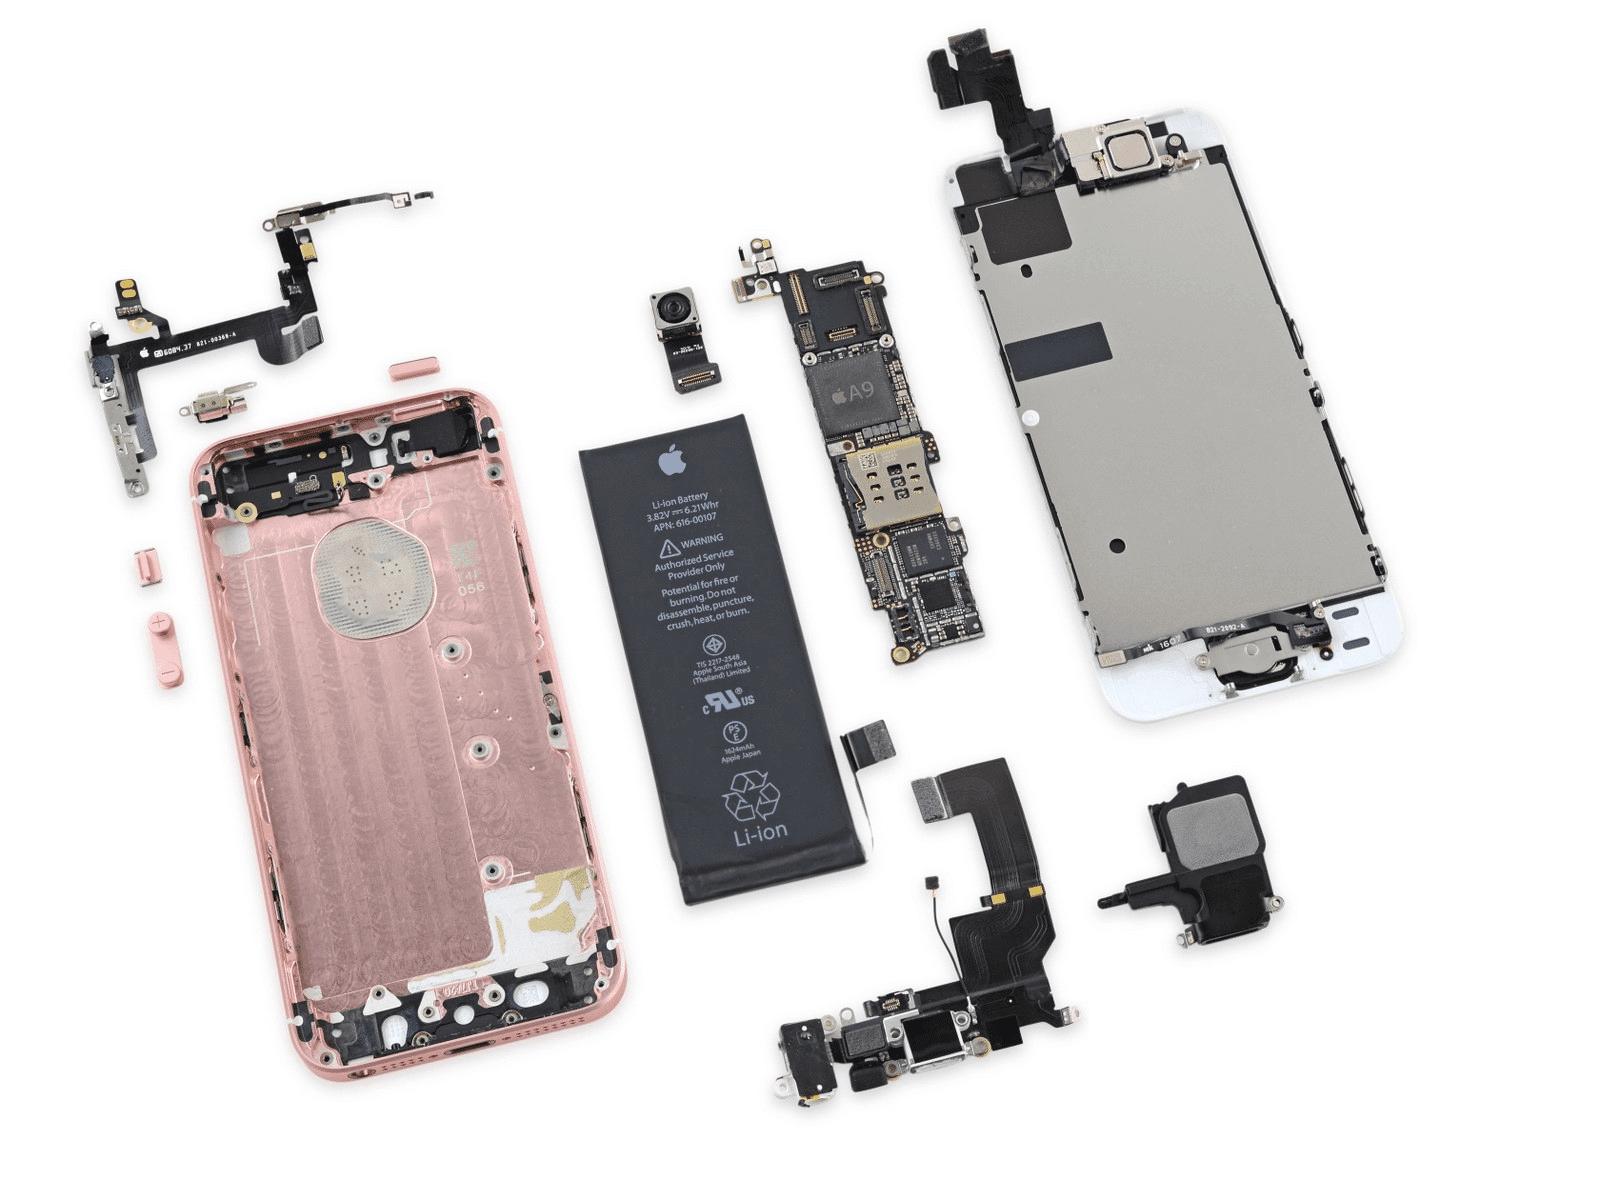 iphone se ifixit teardownjpg - iPhone SE má niekoľko totožných komponentov s iPhonom 5s